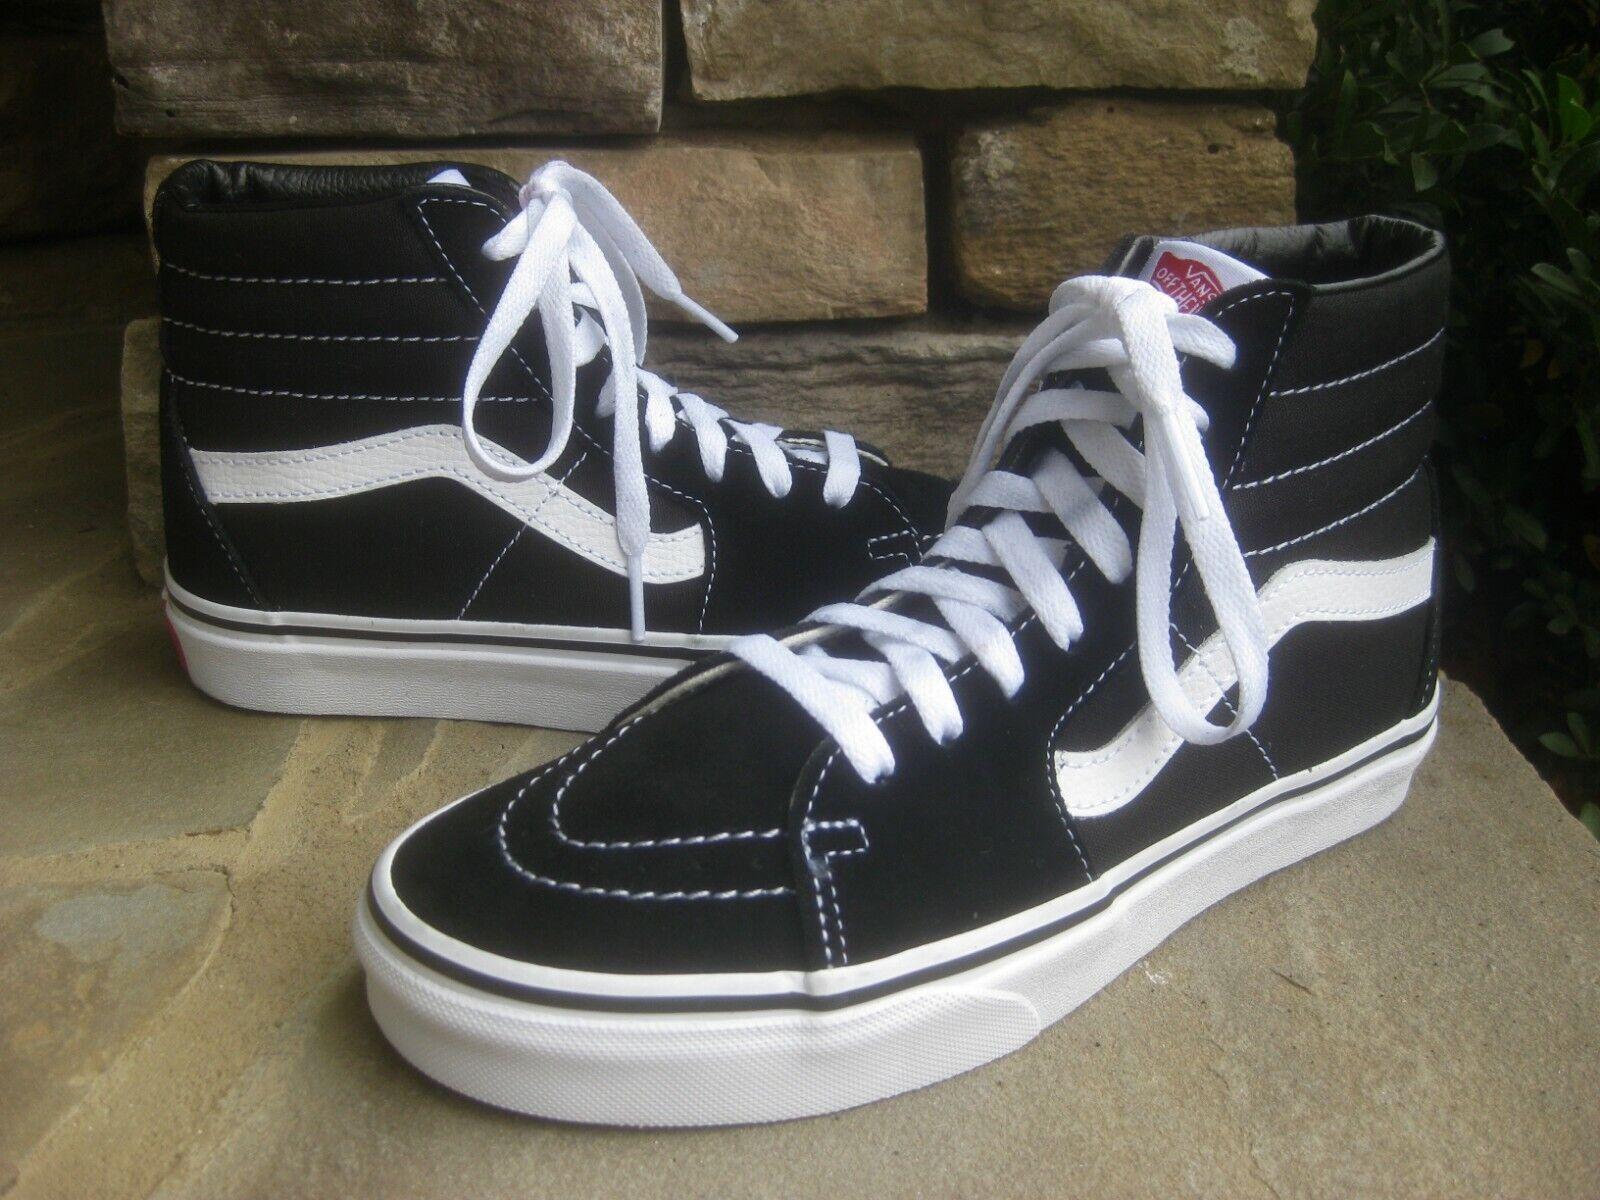 VANS 721494 Men US 8 Black Skate Shoe